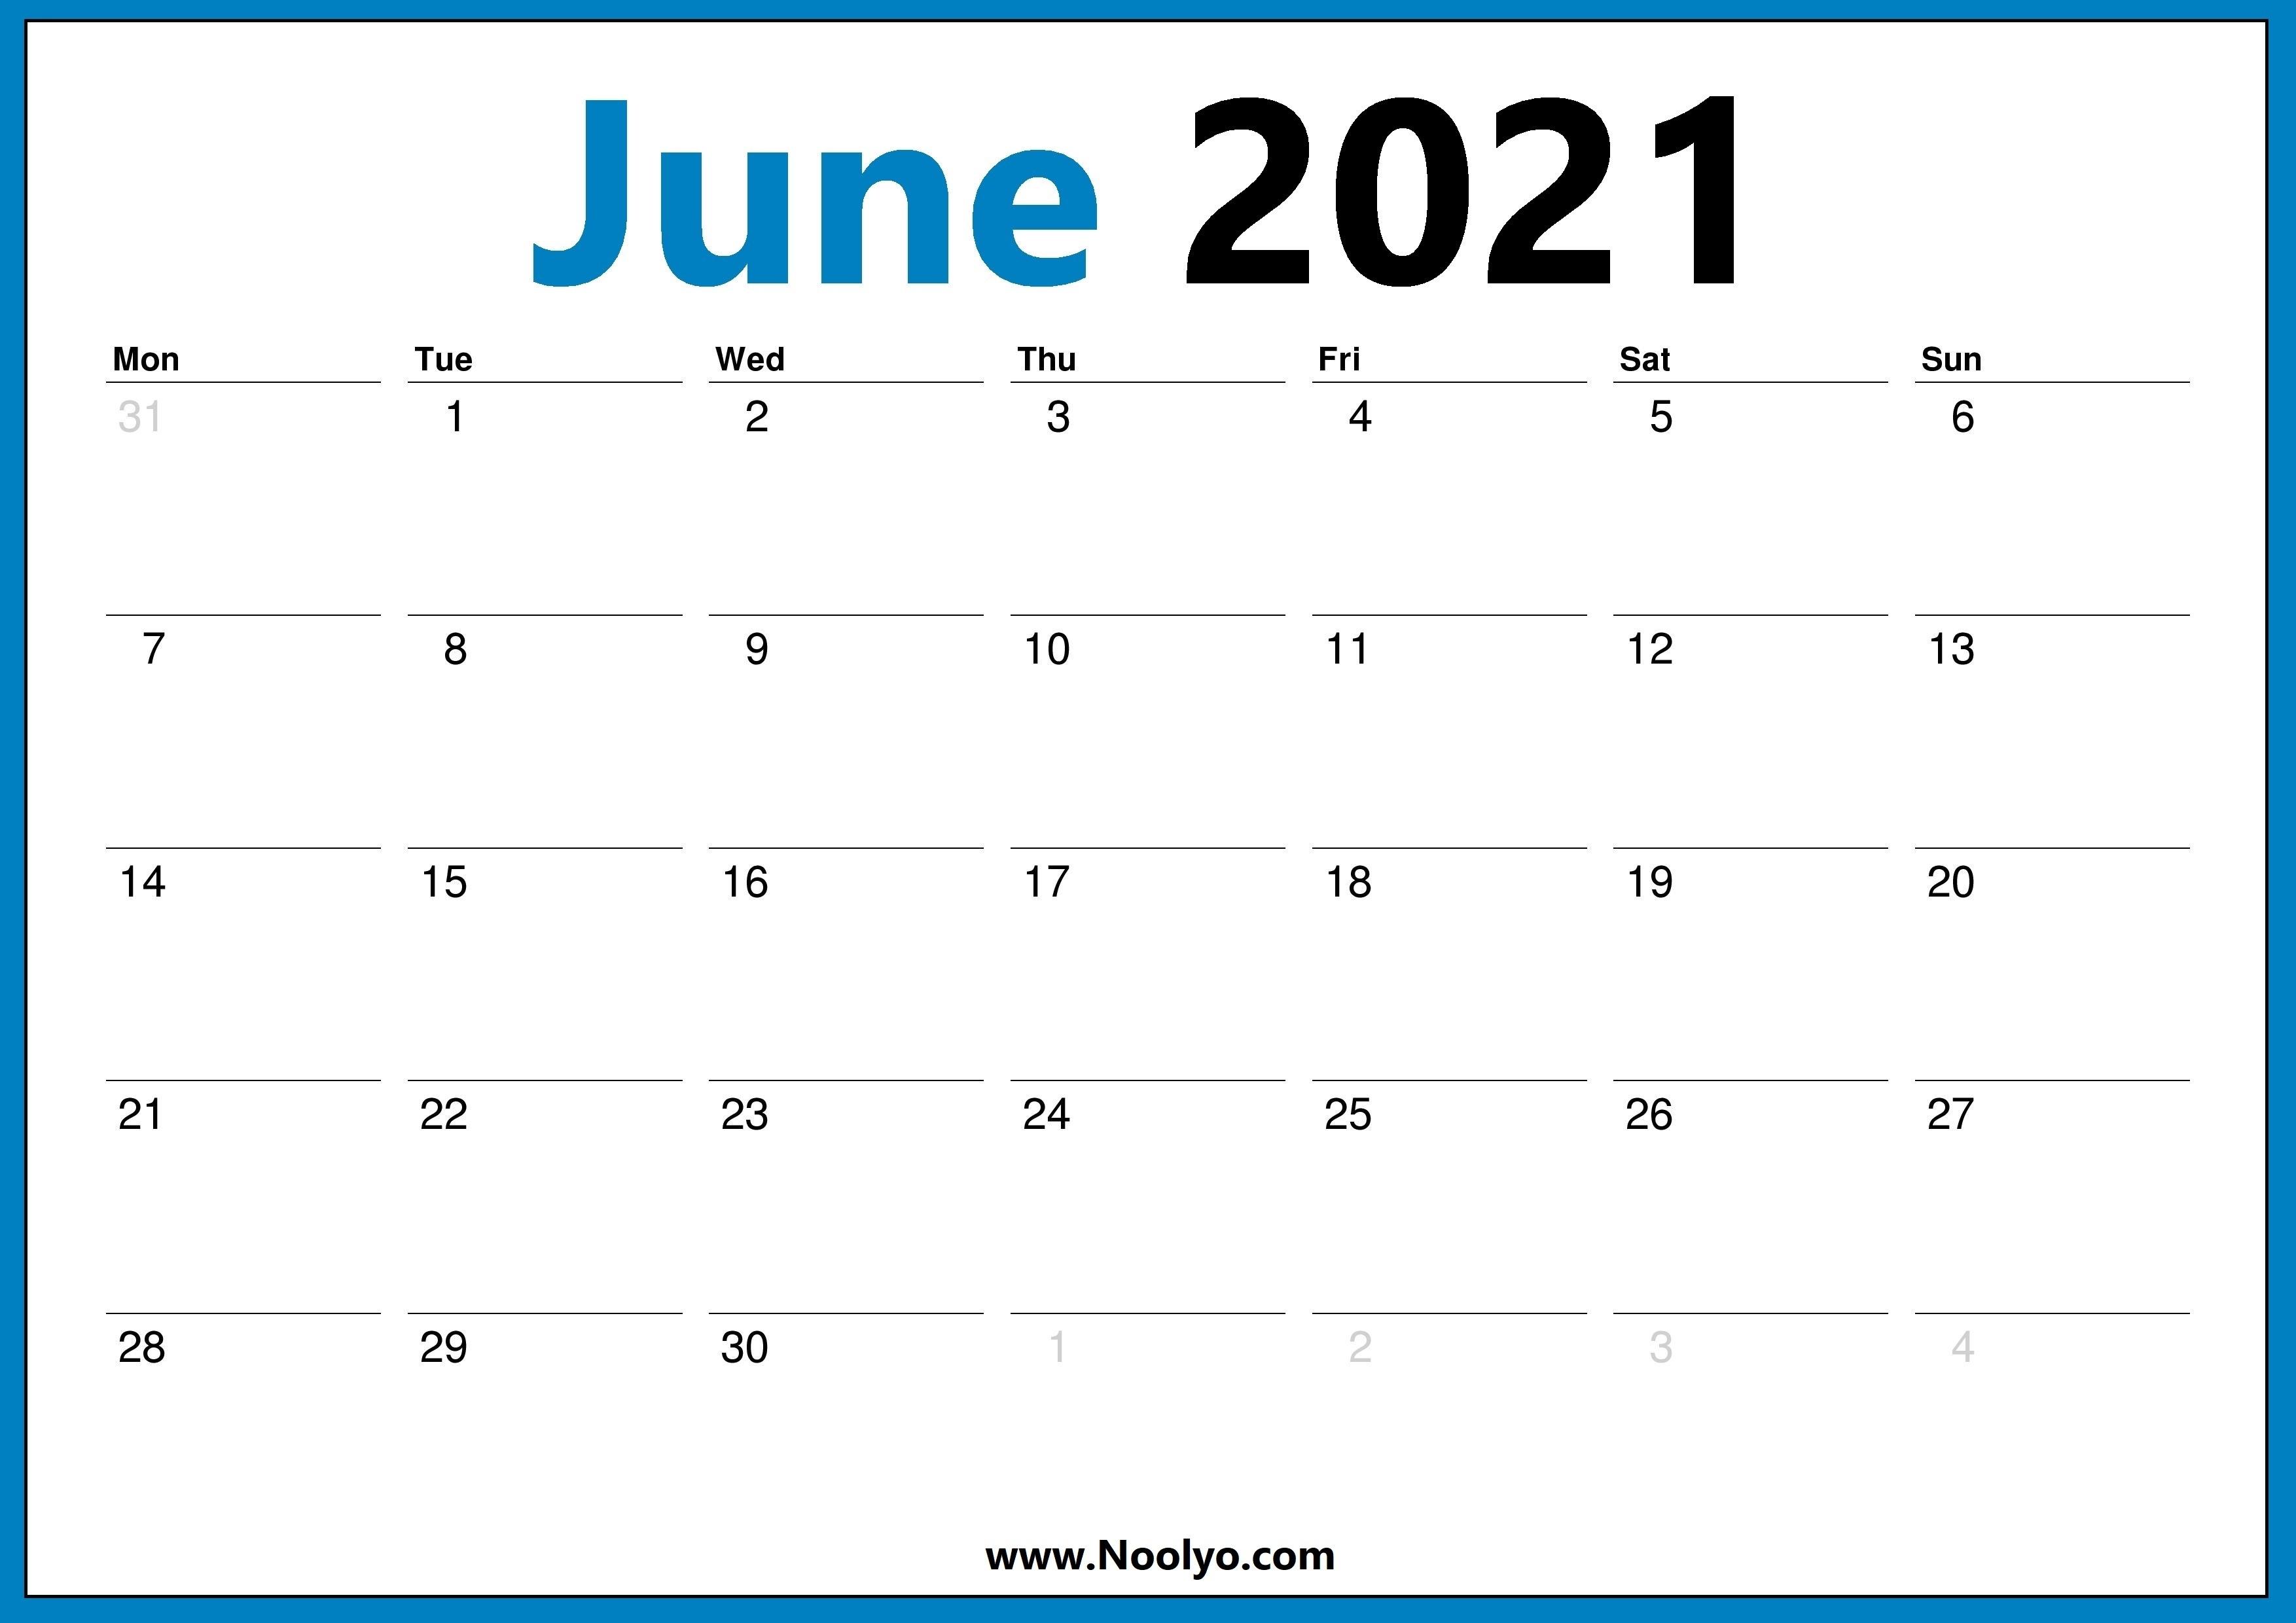 2021 June Calendar Monday Start Calendar Free Downloads - Noolyo June 2020 To June 2021 Calendar Printable